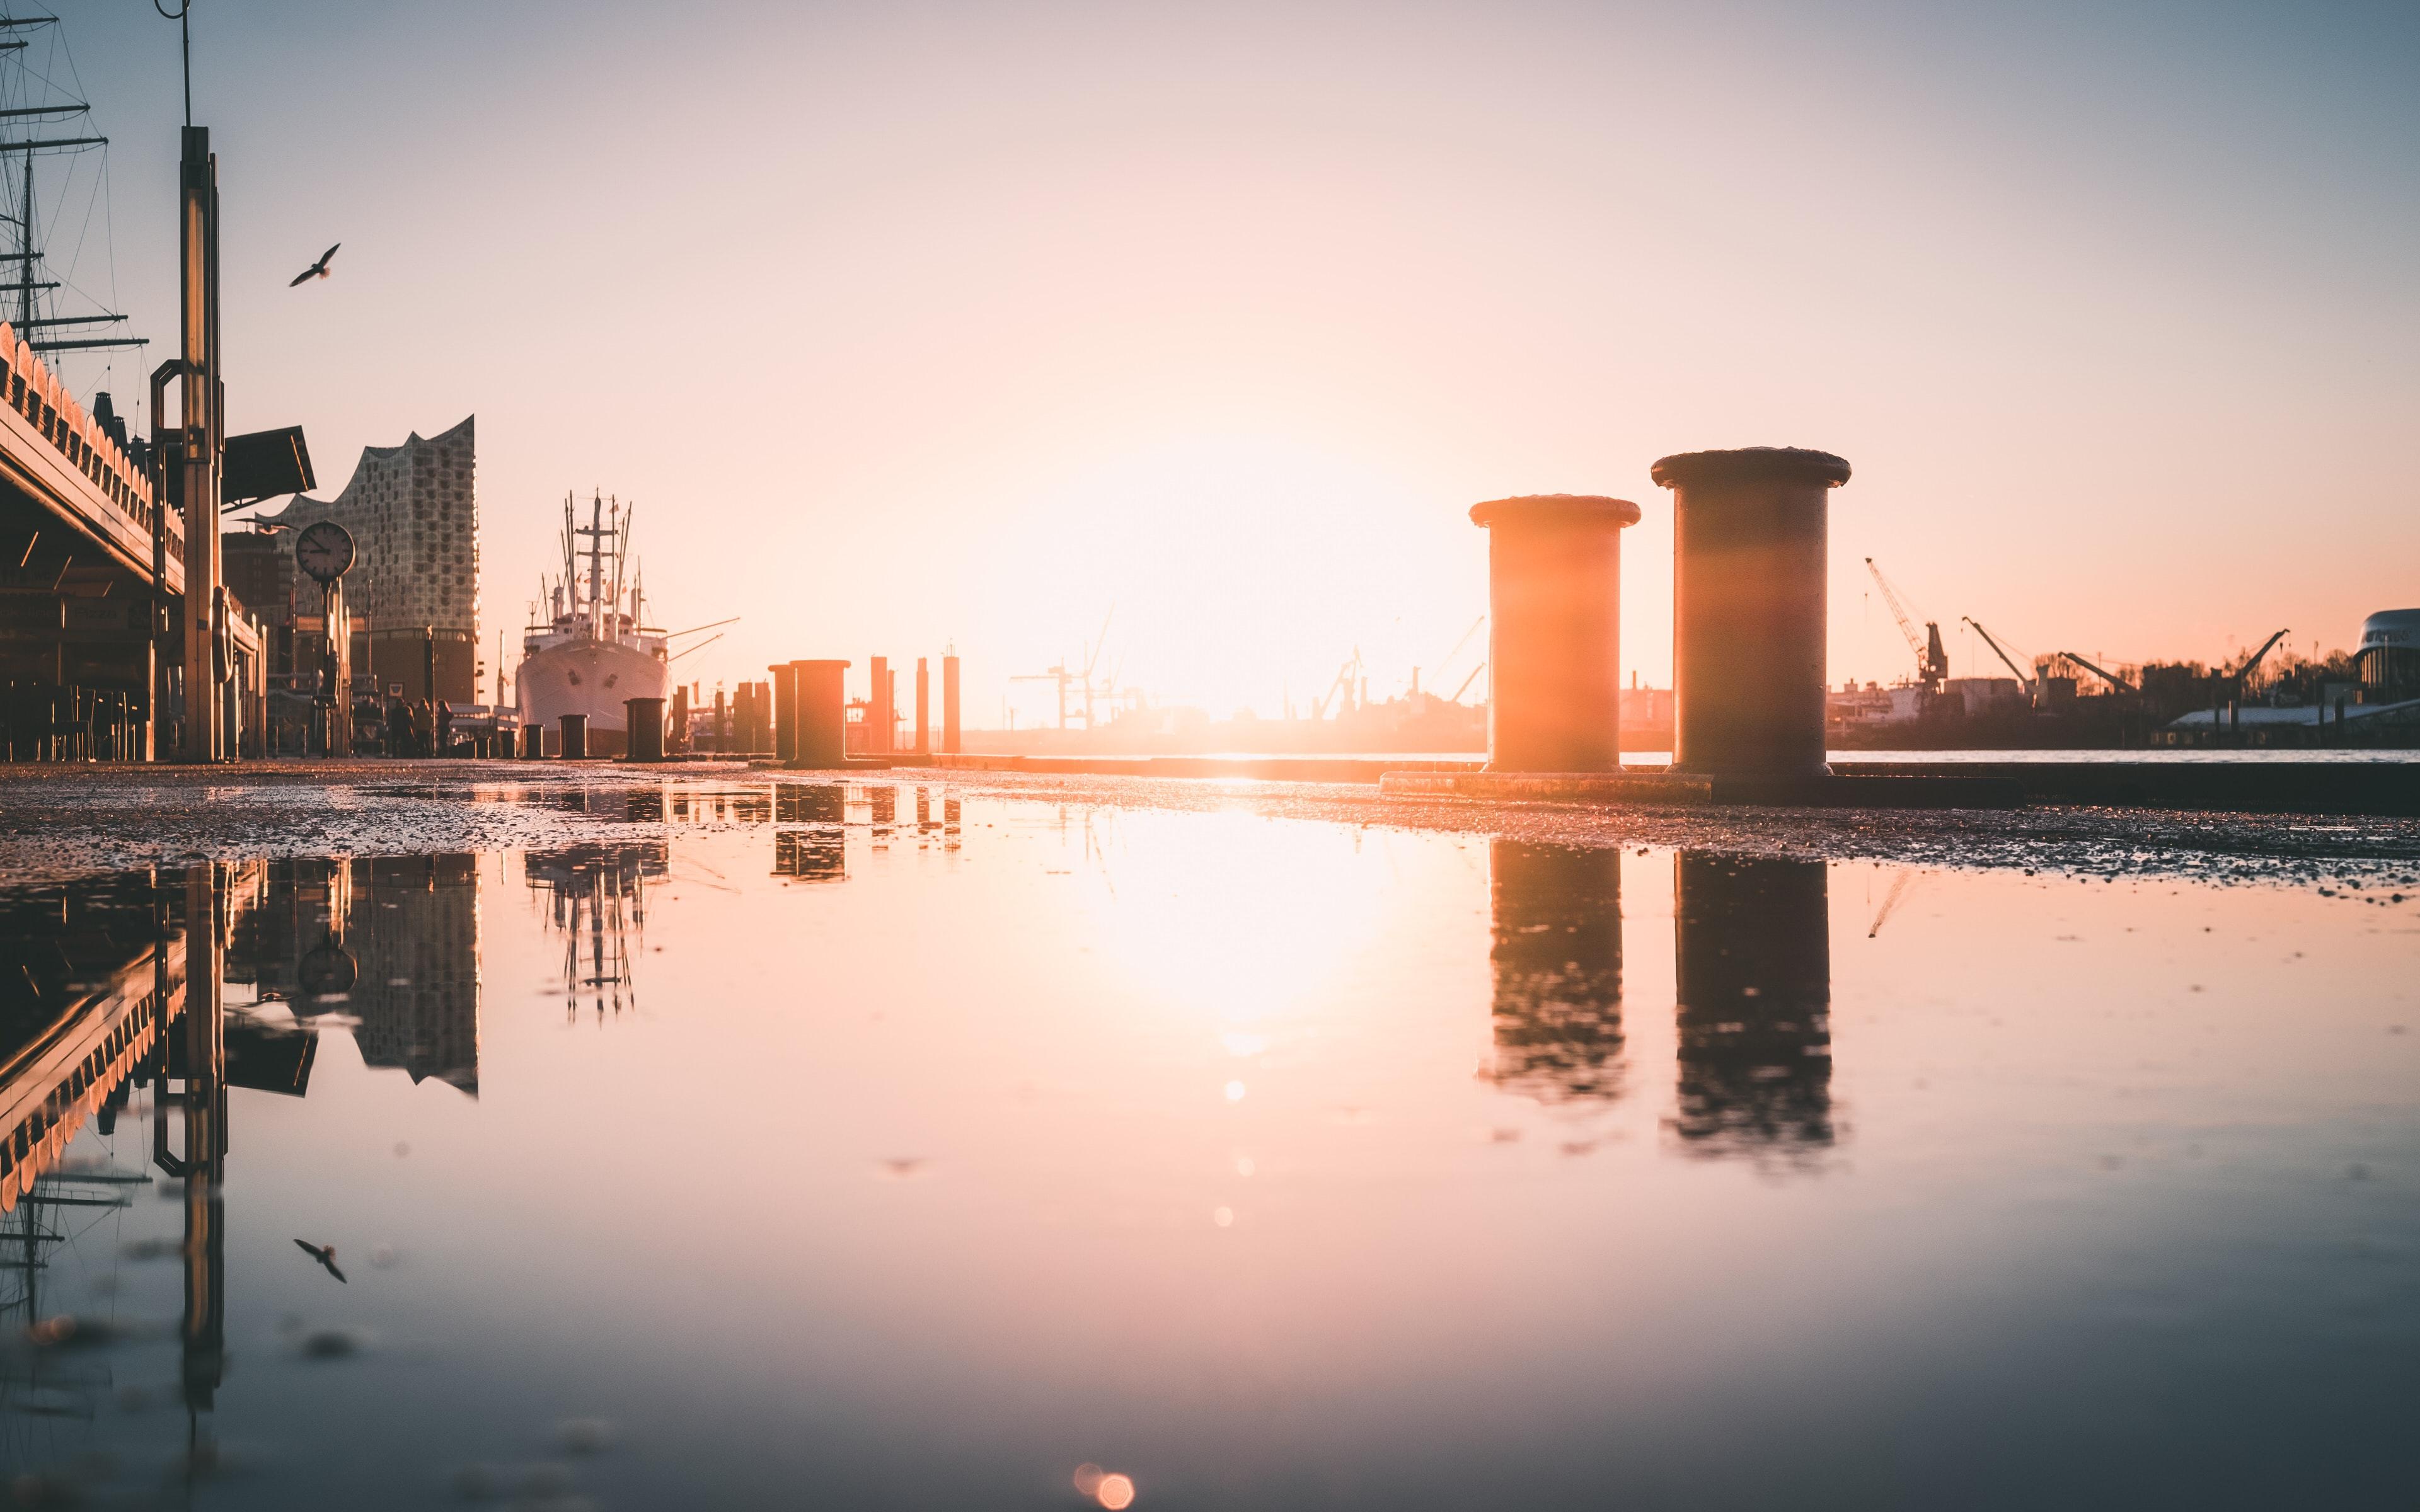 Logistikimmobilie in Hamburg erfolgreich neu vermietet / Successful new lease for logistics property in Hamburg